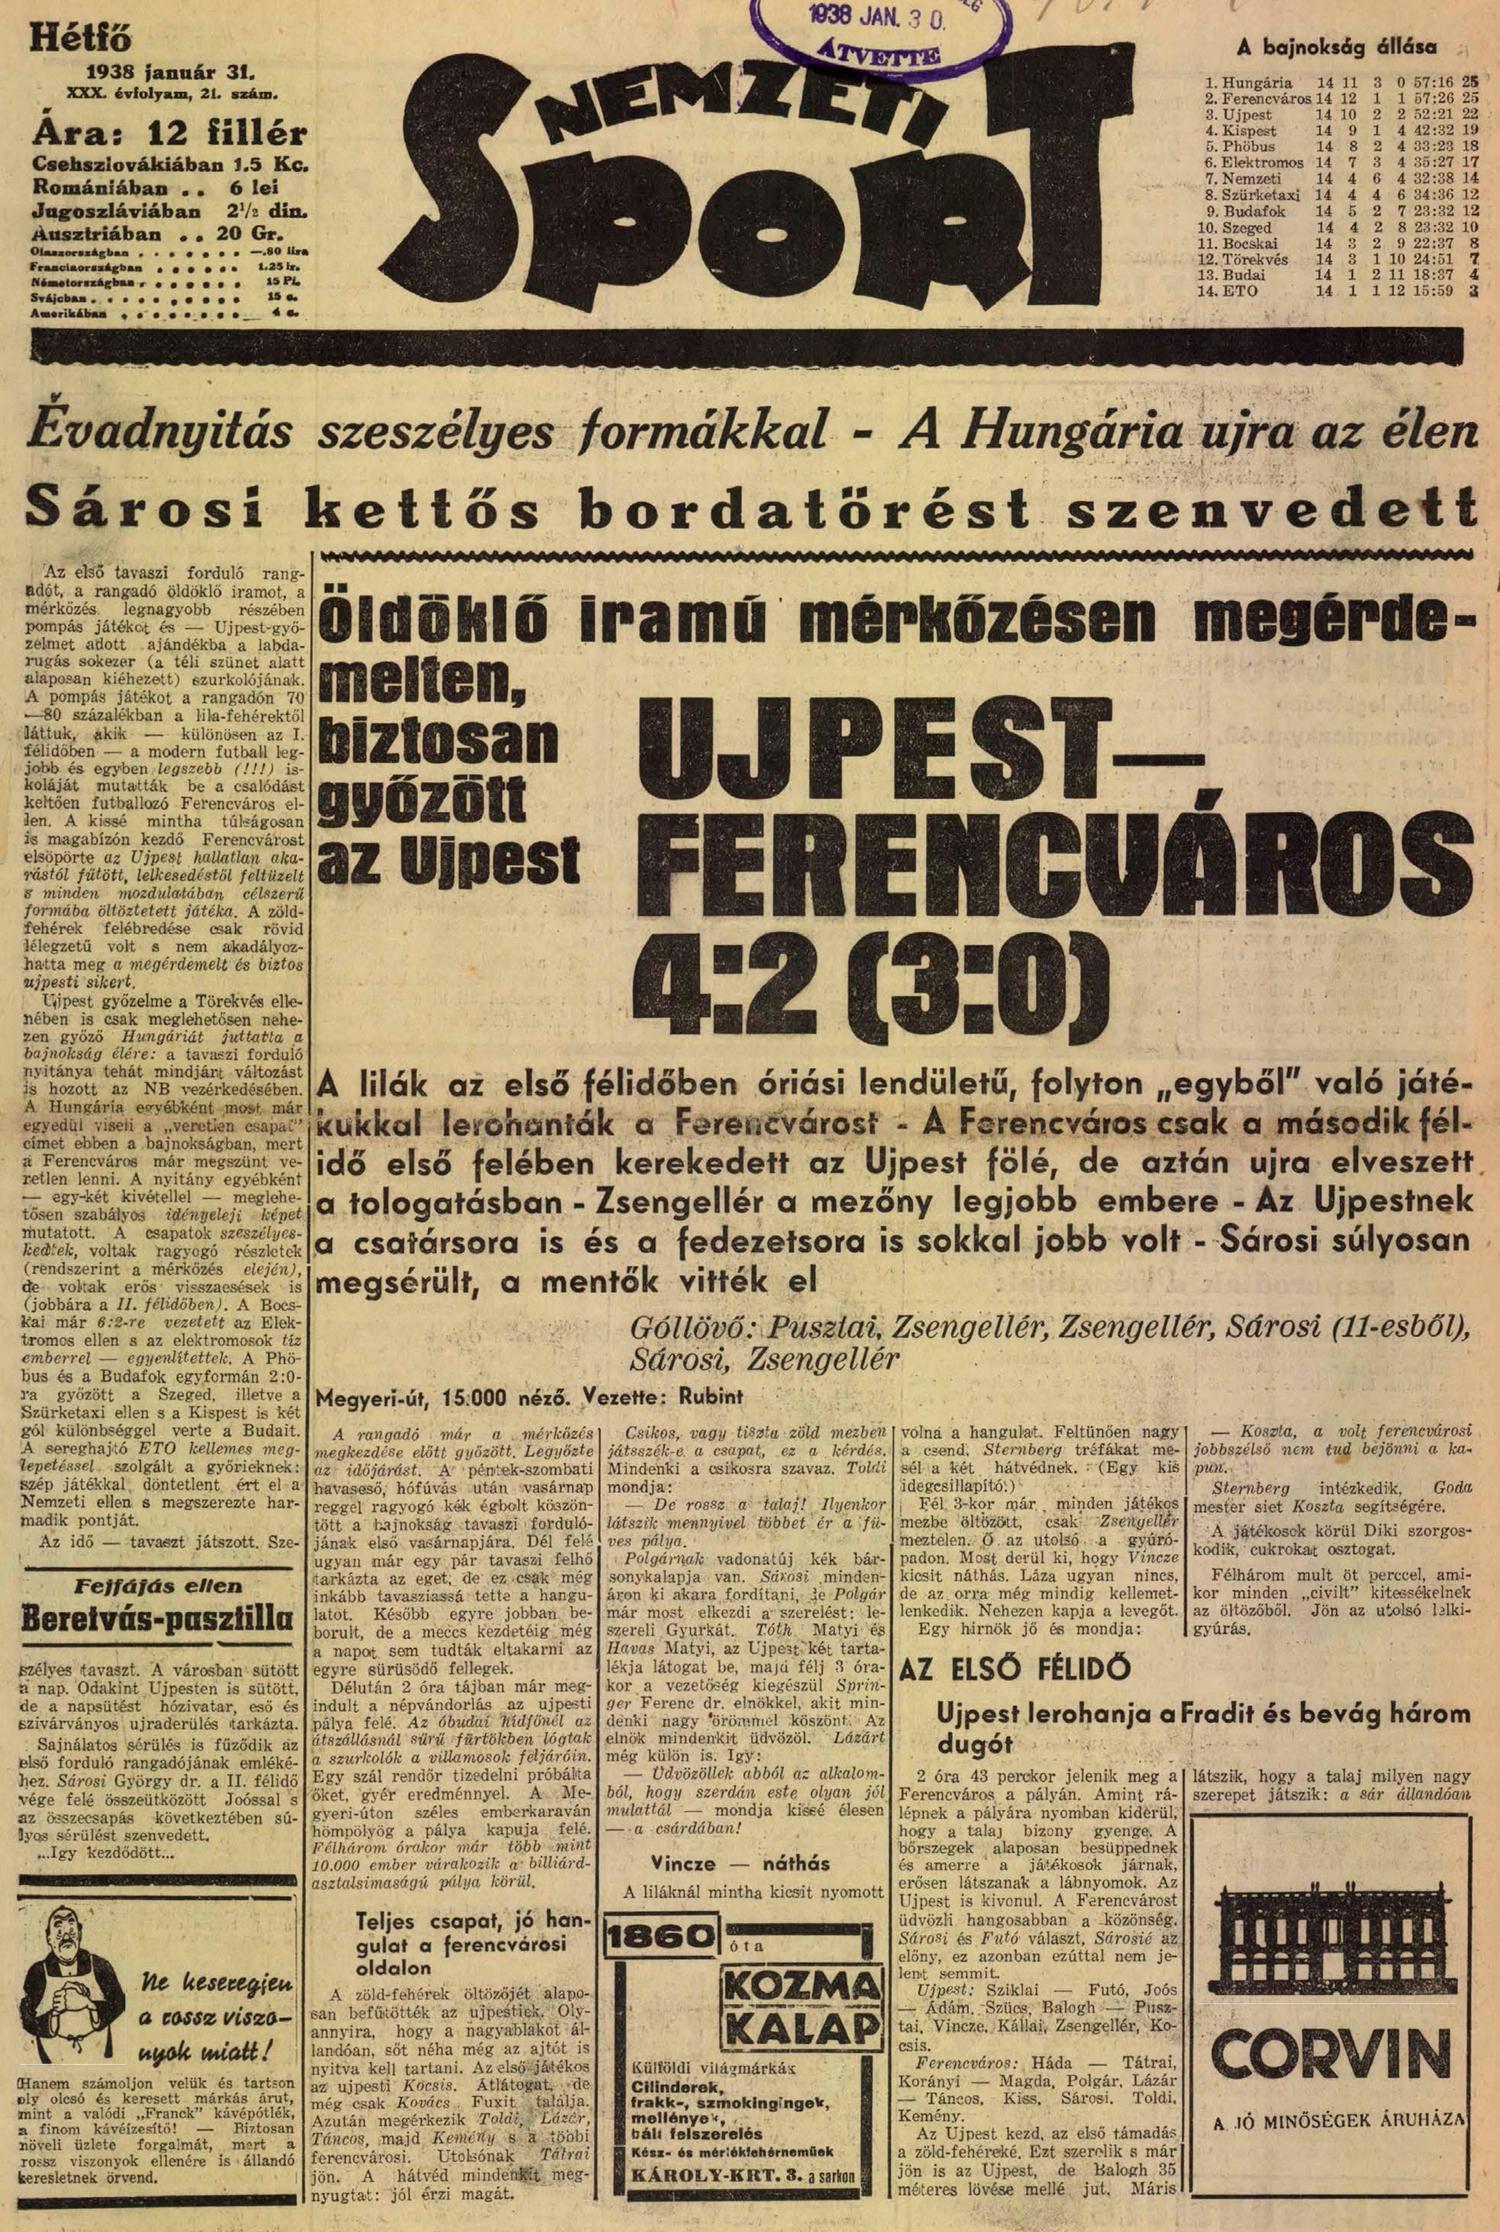 NS-19380131-01-19380130